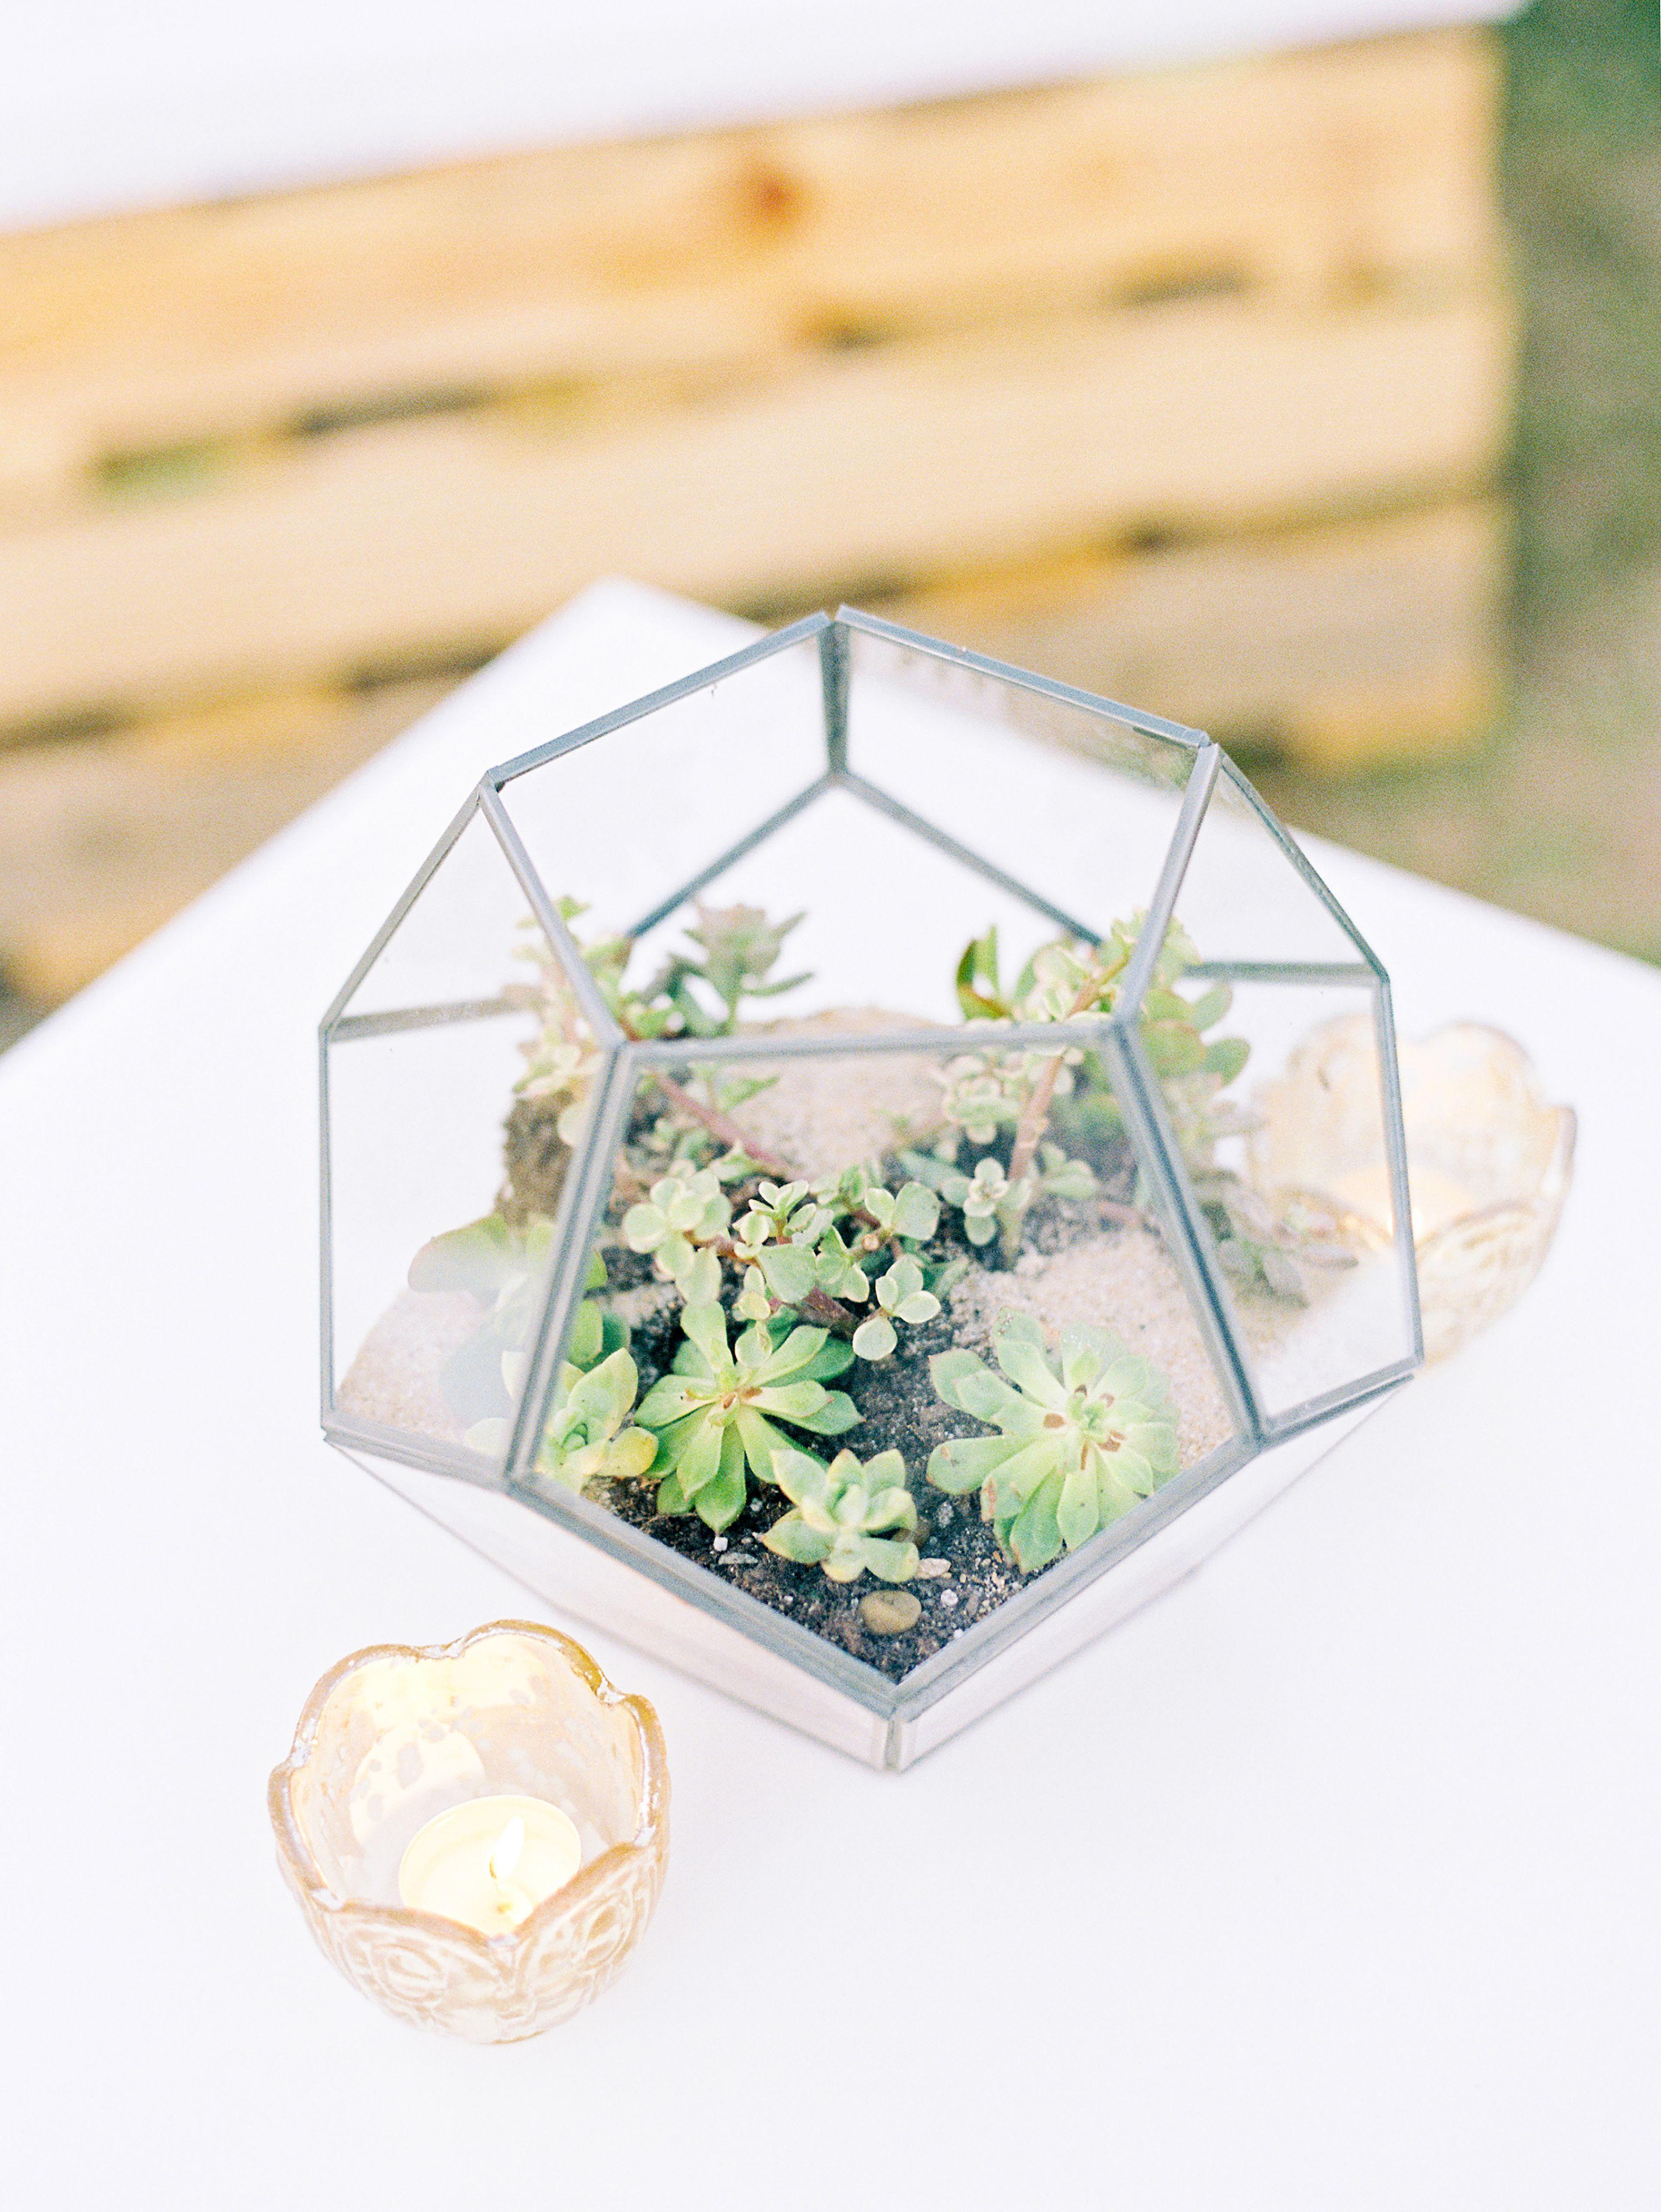 Geometric SucculentFilled Terrarium Wedding Centerpiece